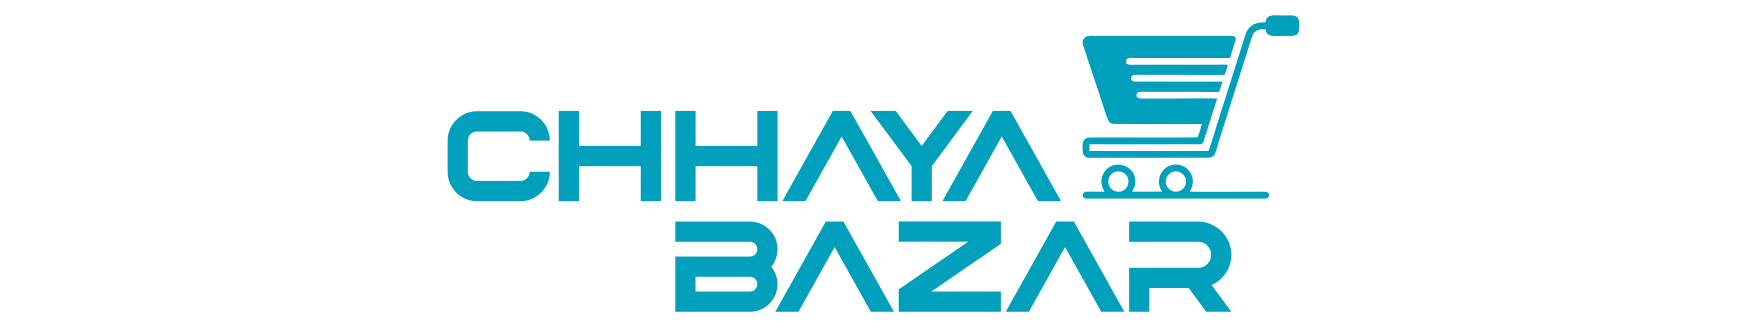 Chhaya Bazar